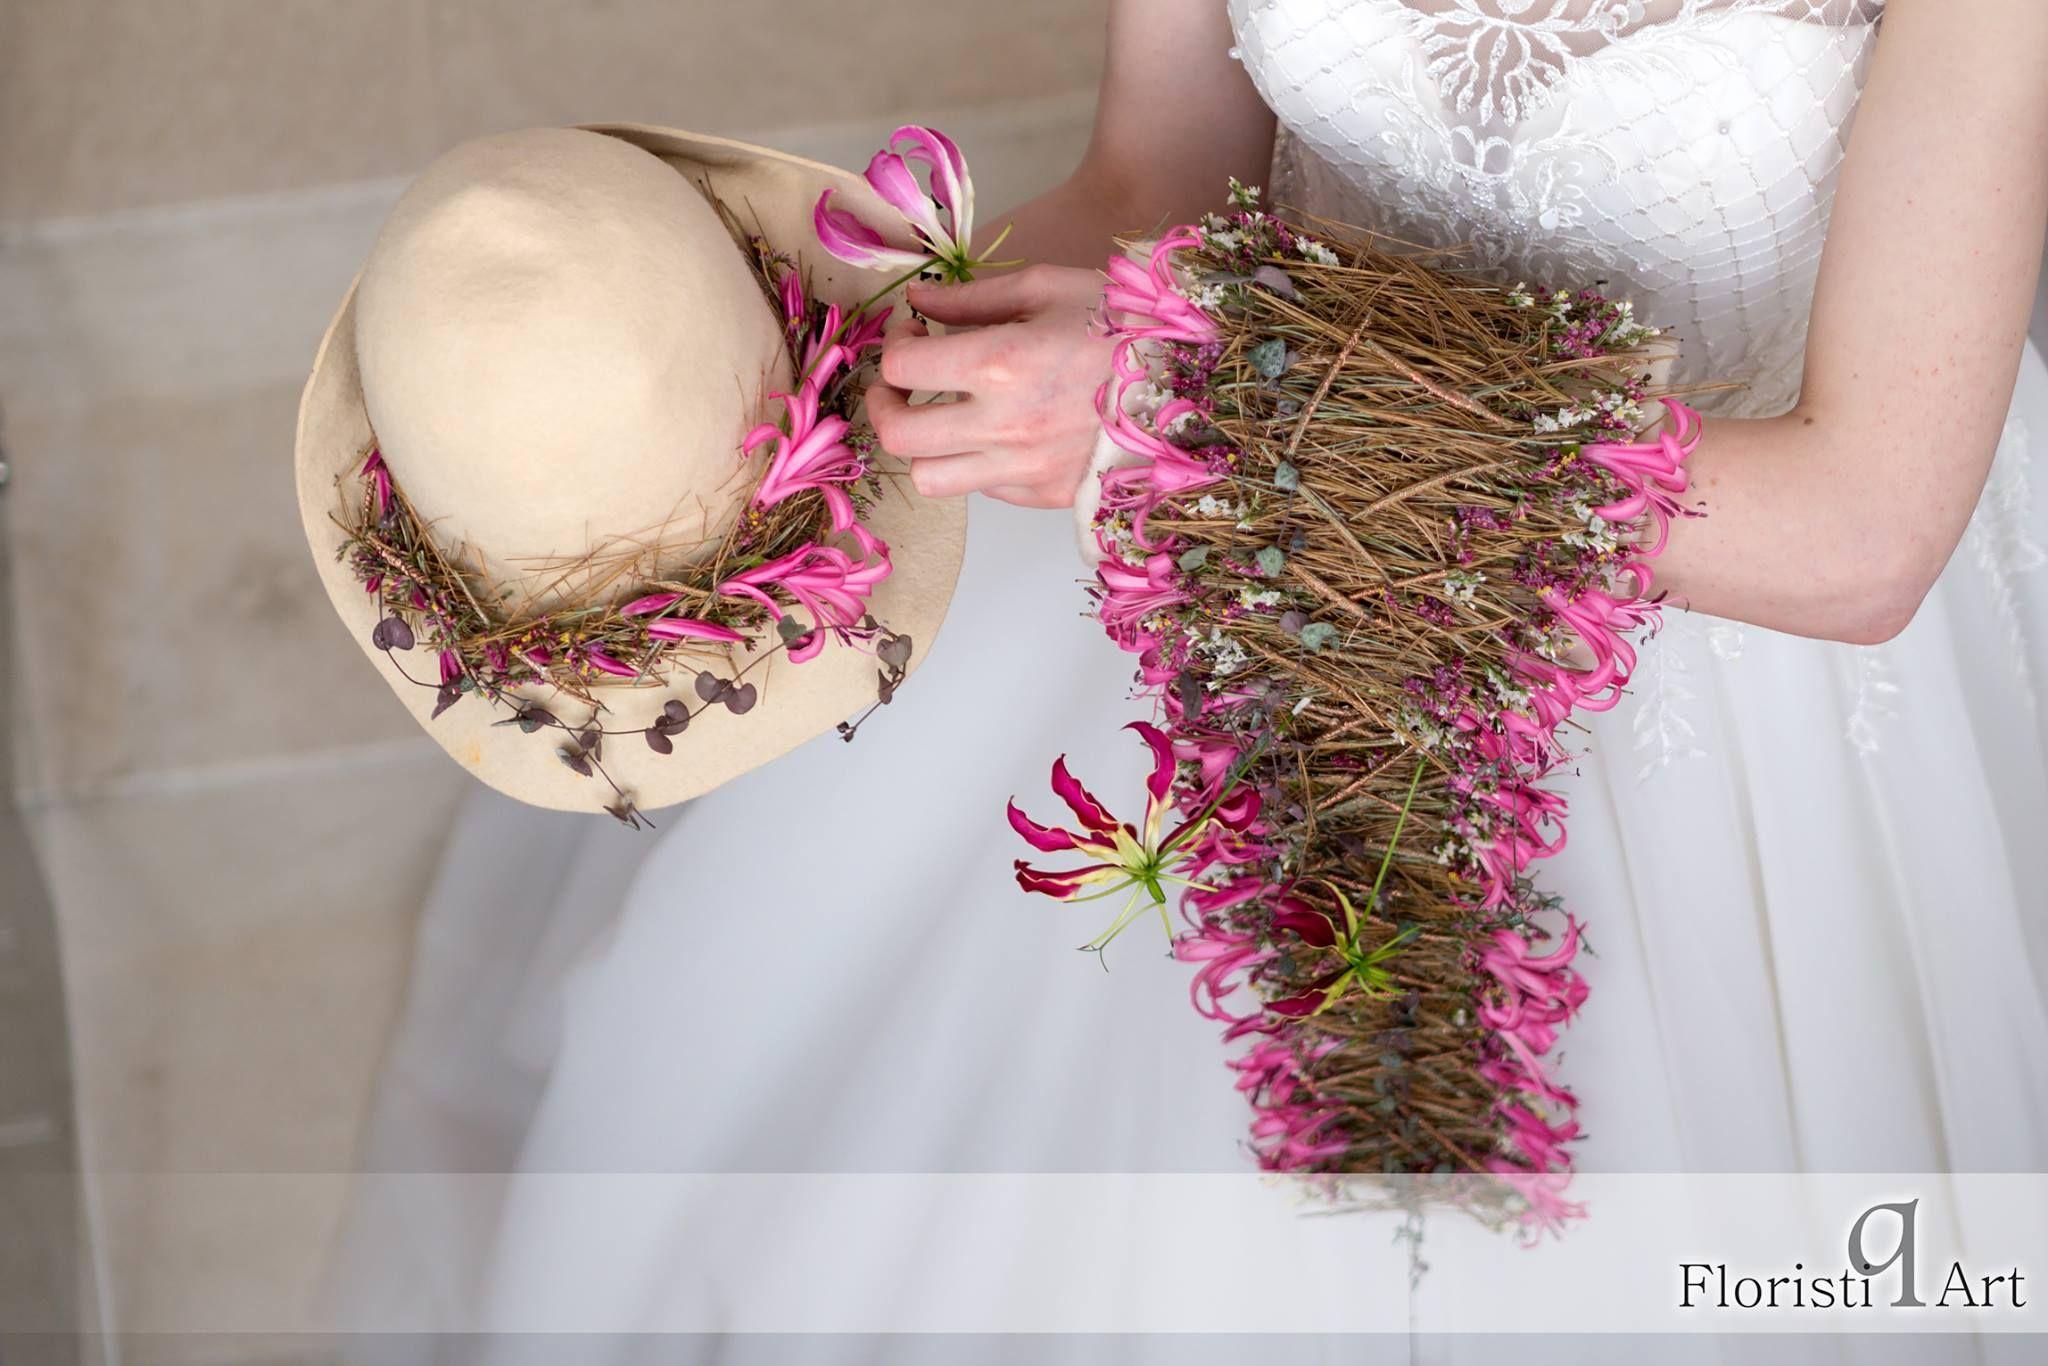 Floral Designer: Andreea Stör MUA: Ioana Malai Model: Veronika Onea Photo credit: Zsolt Gabriel Horvath Dress: Maya-Rochii de mireasa Event: Bloom Your Business — at Floristiq Art International.